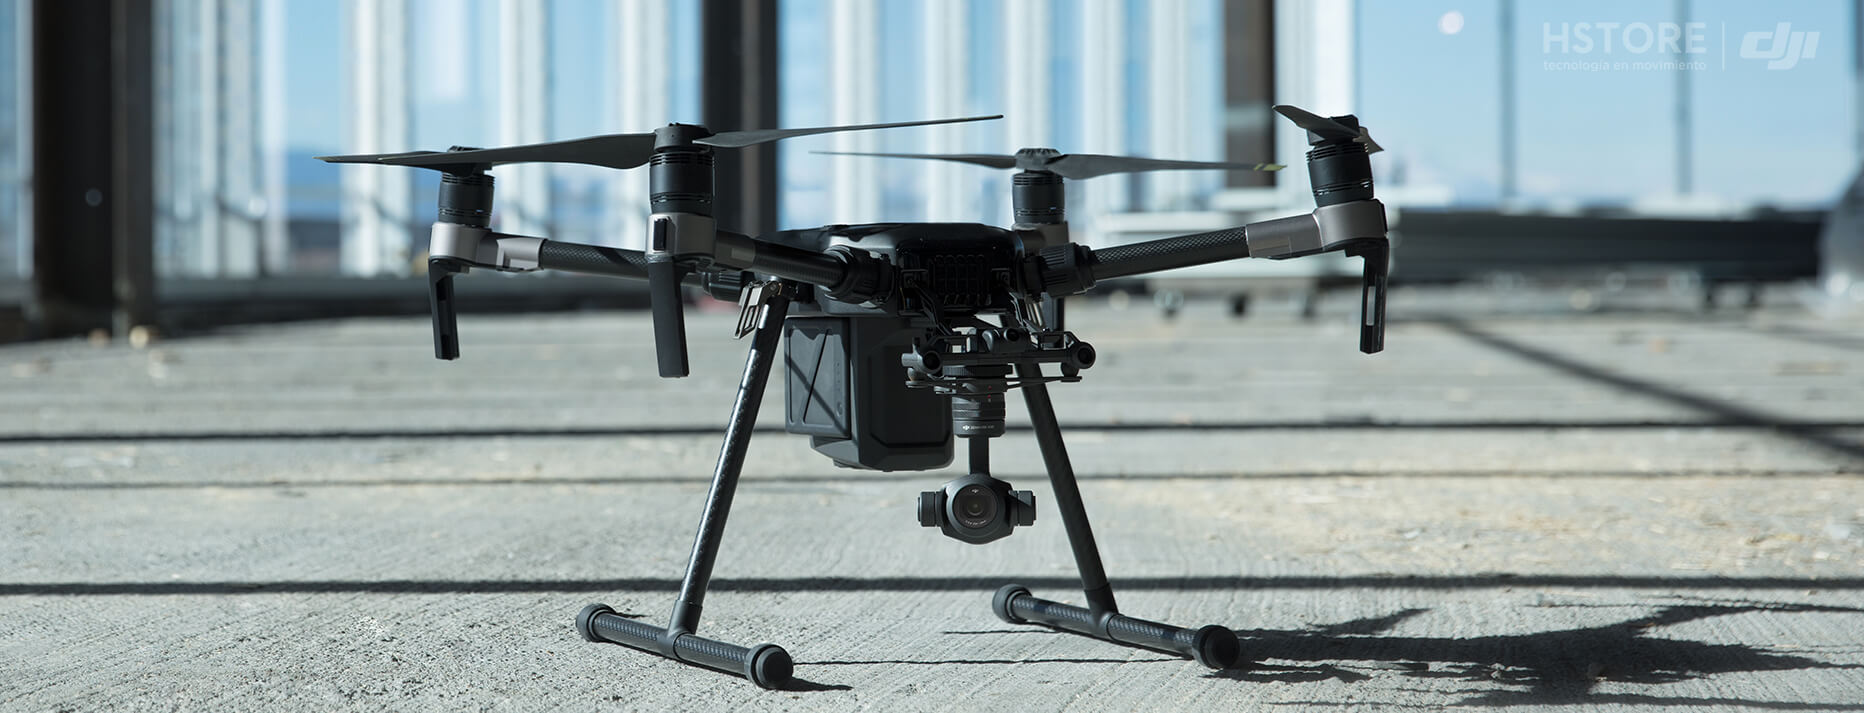 Drone Matrice 200 Serie